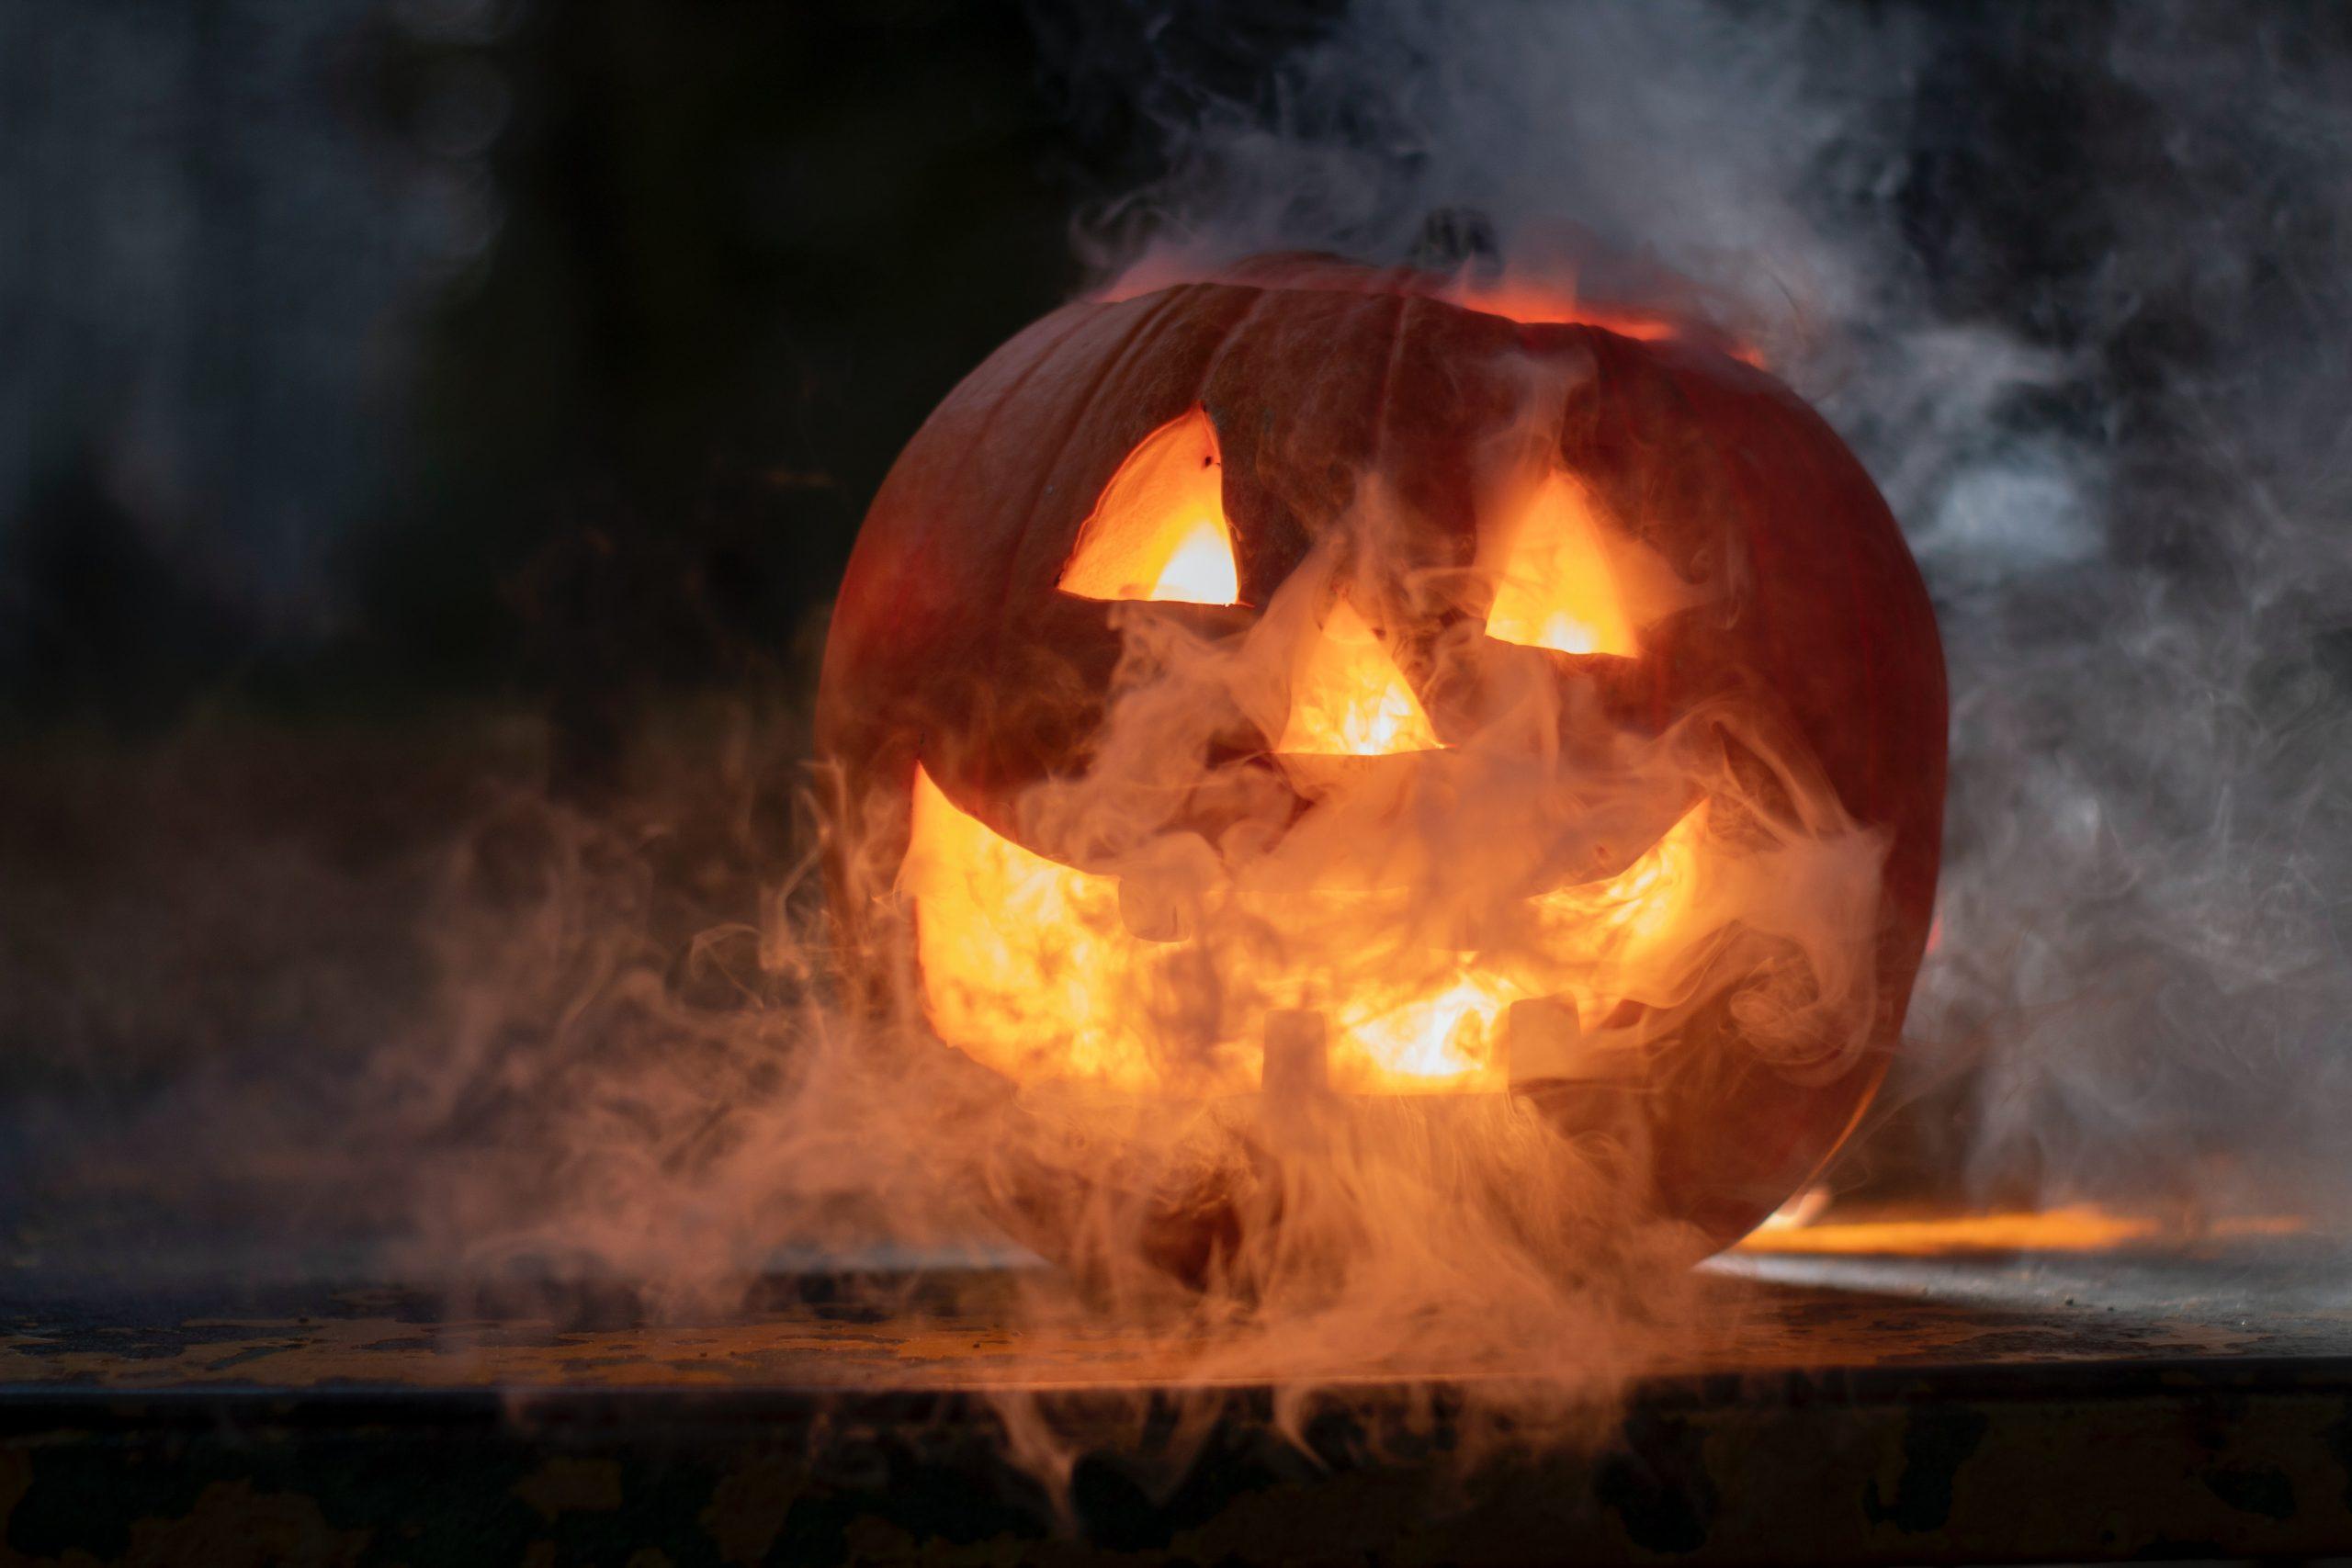 Pumpkin with smoke